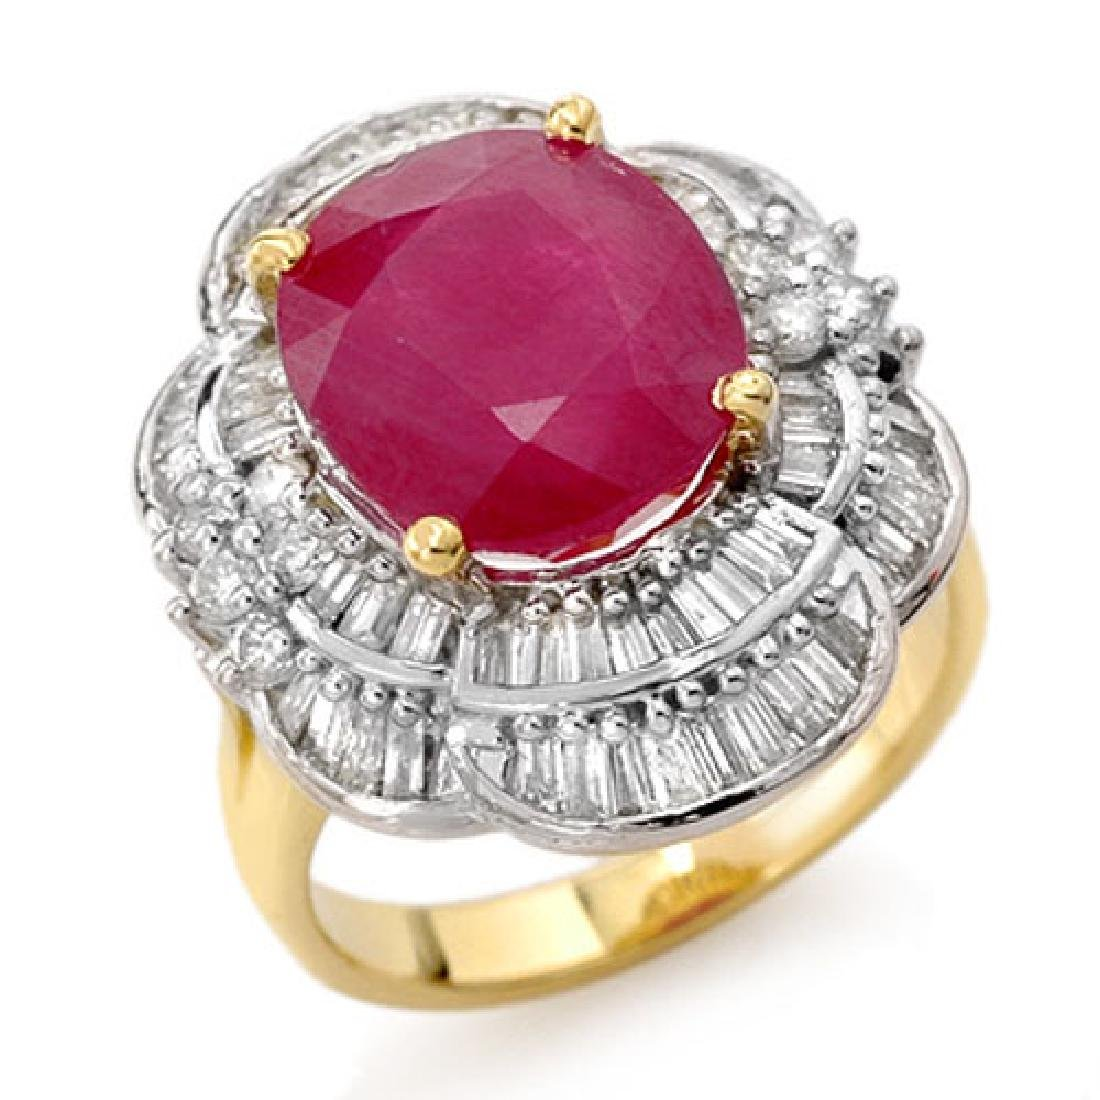 5.59 CTW Ruby & Diamond Ring 14K Yellow Gold